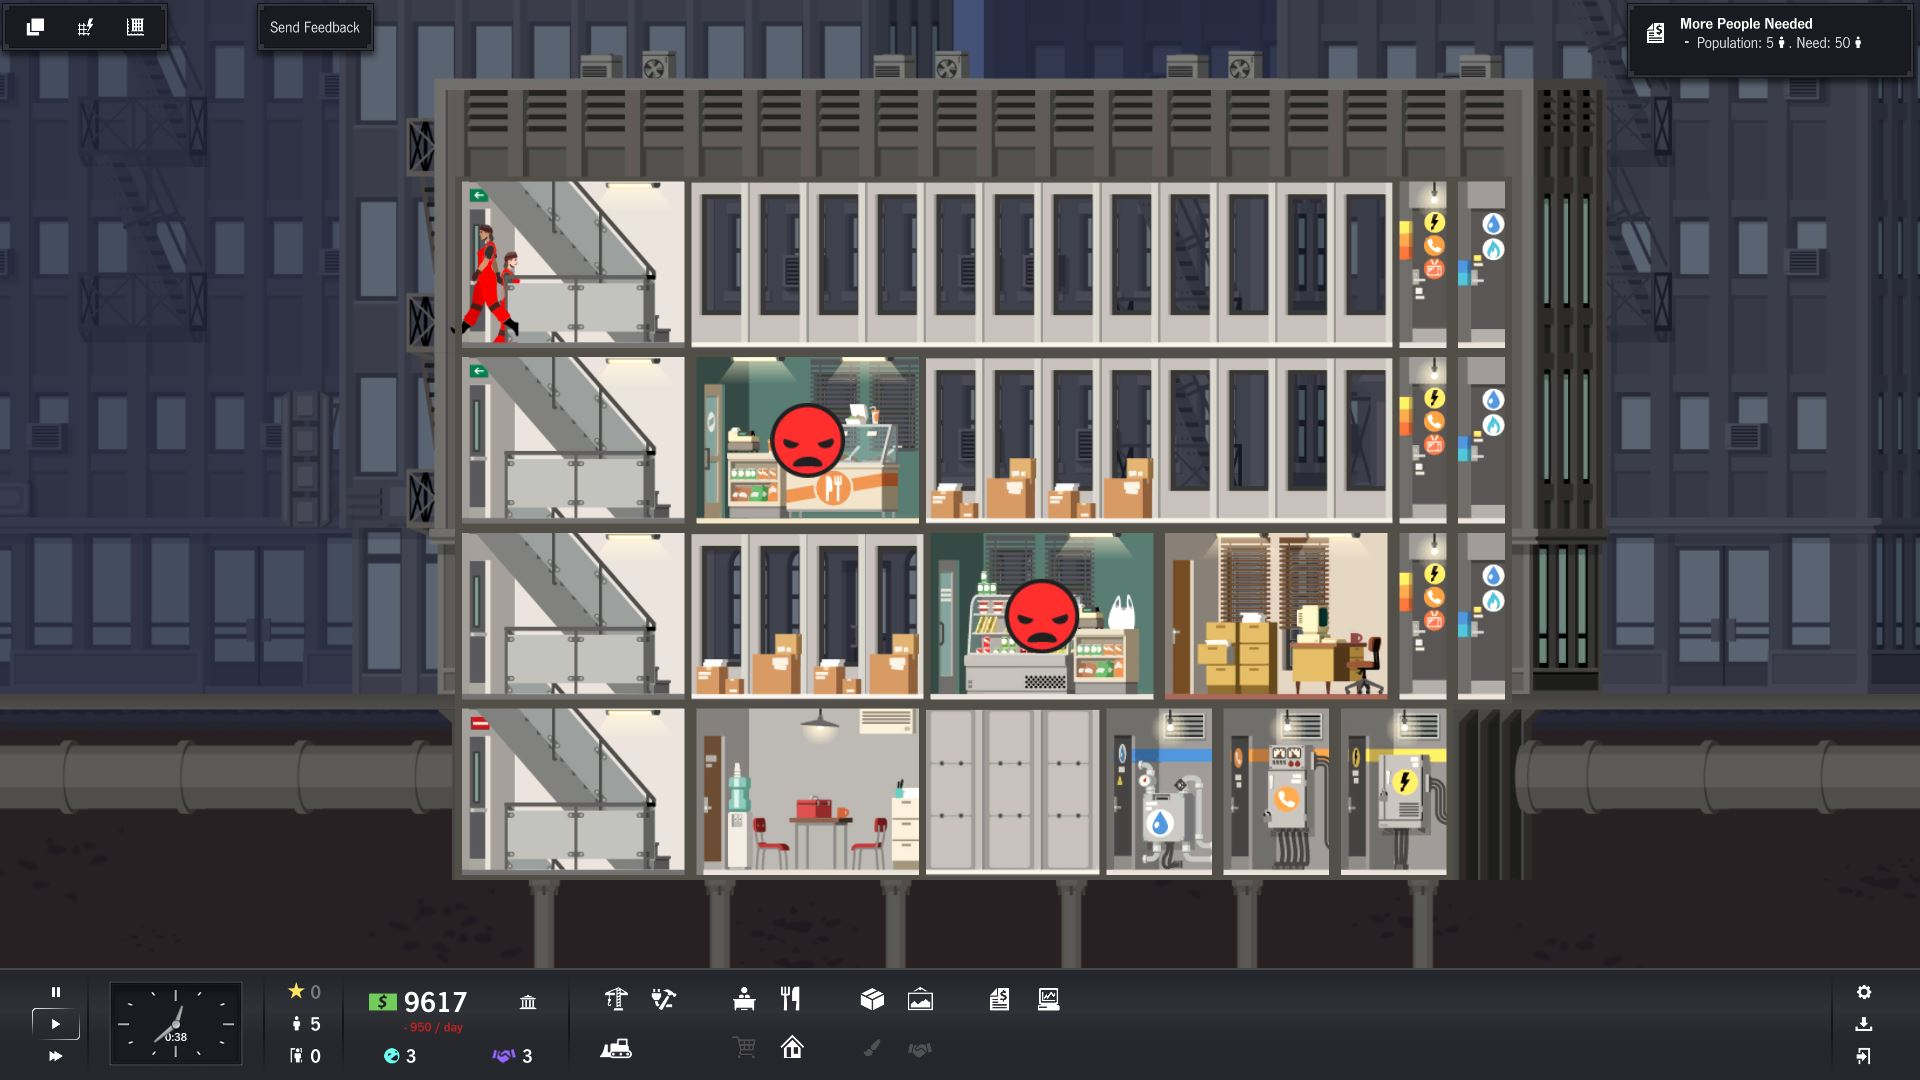 Project Highrise Screenshot 1